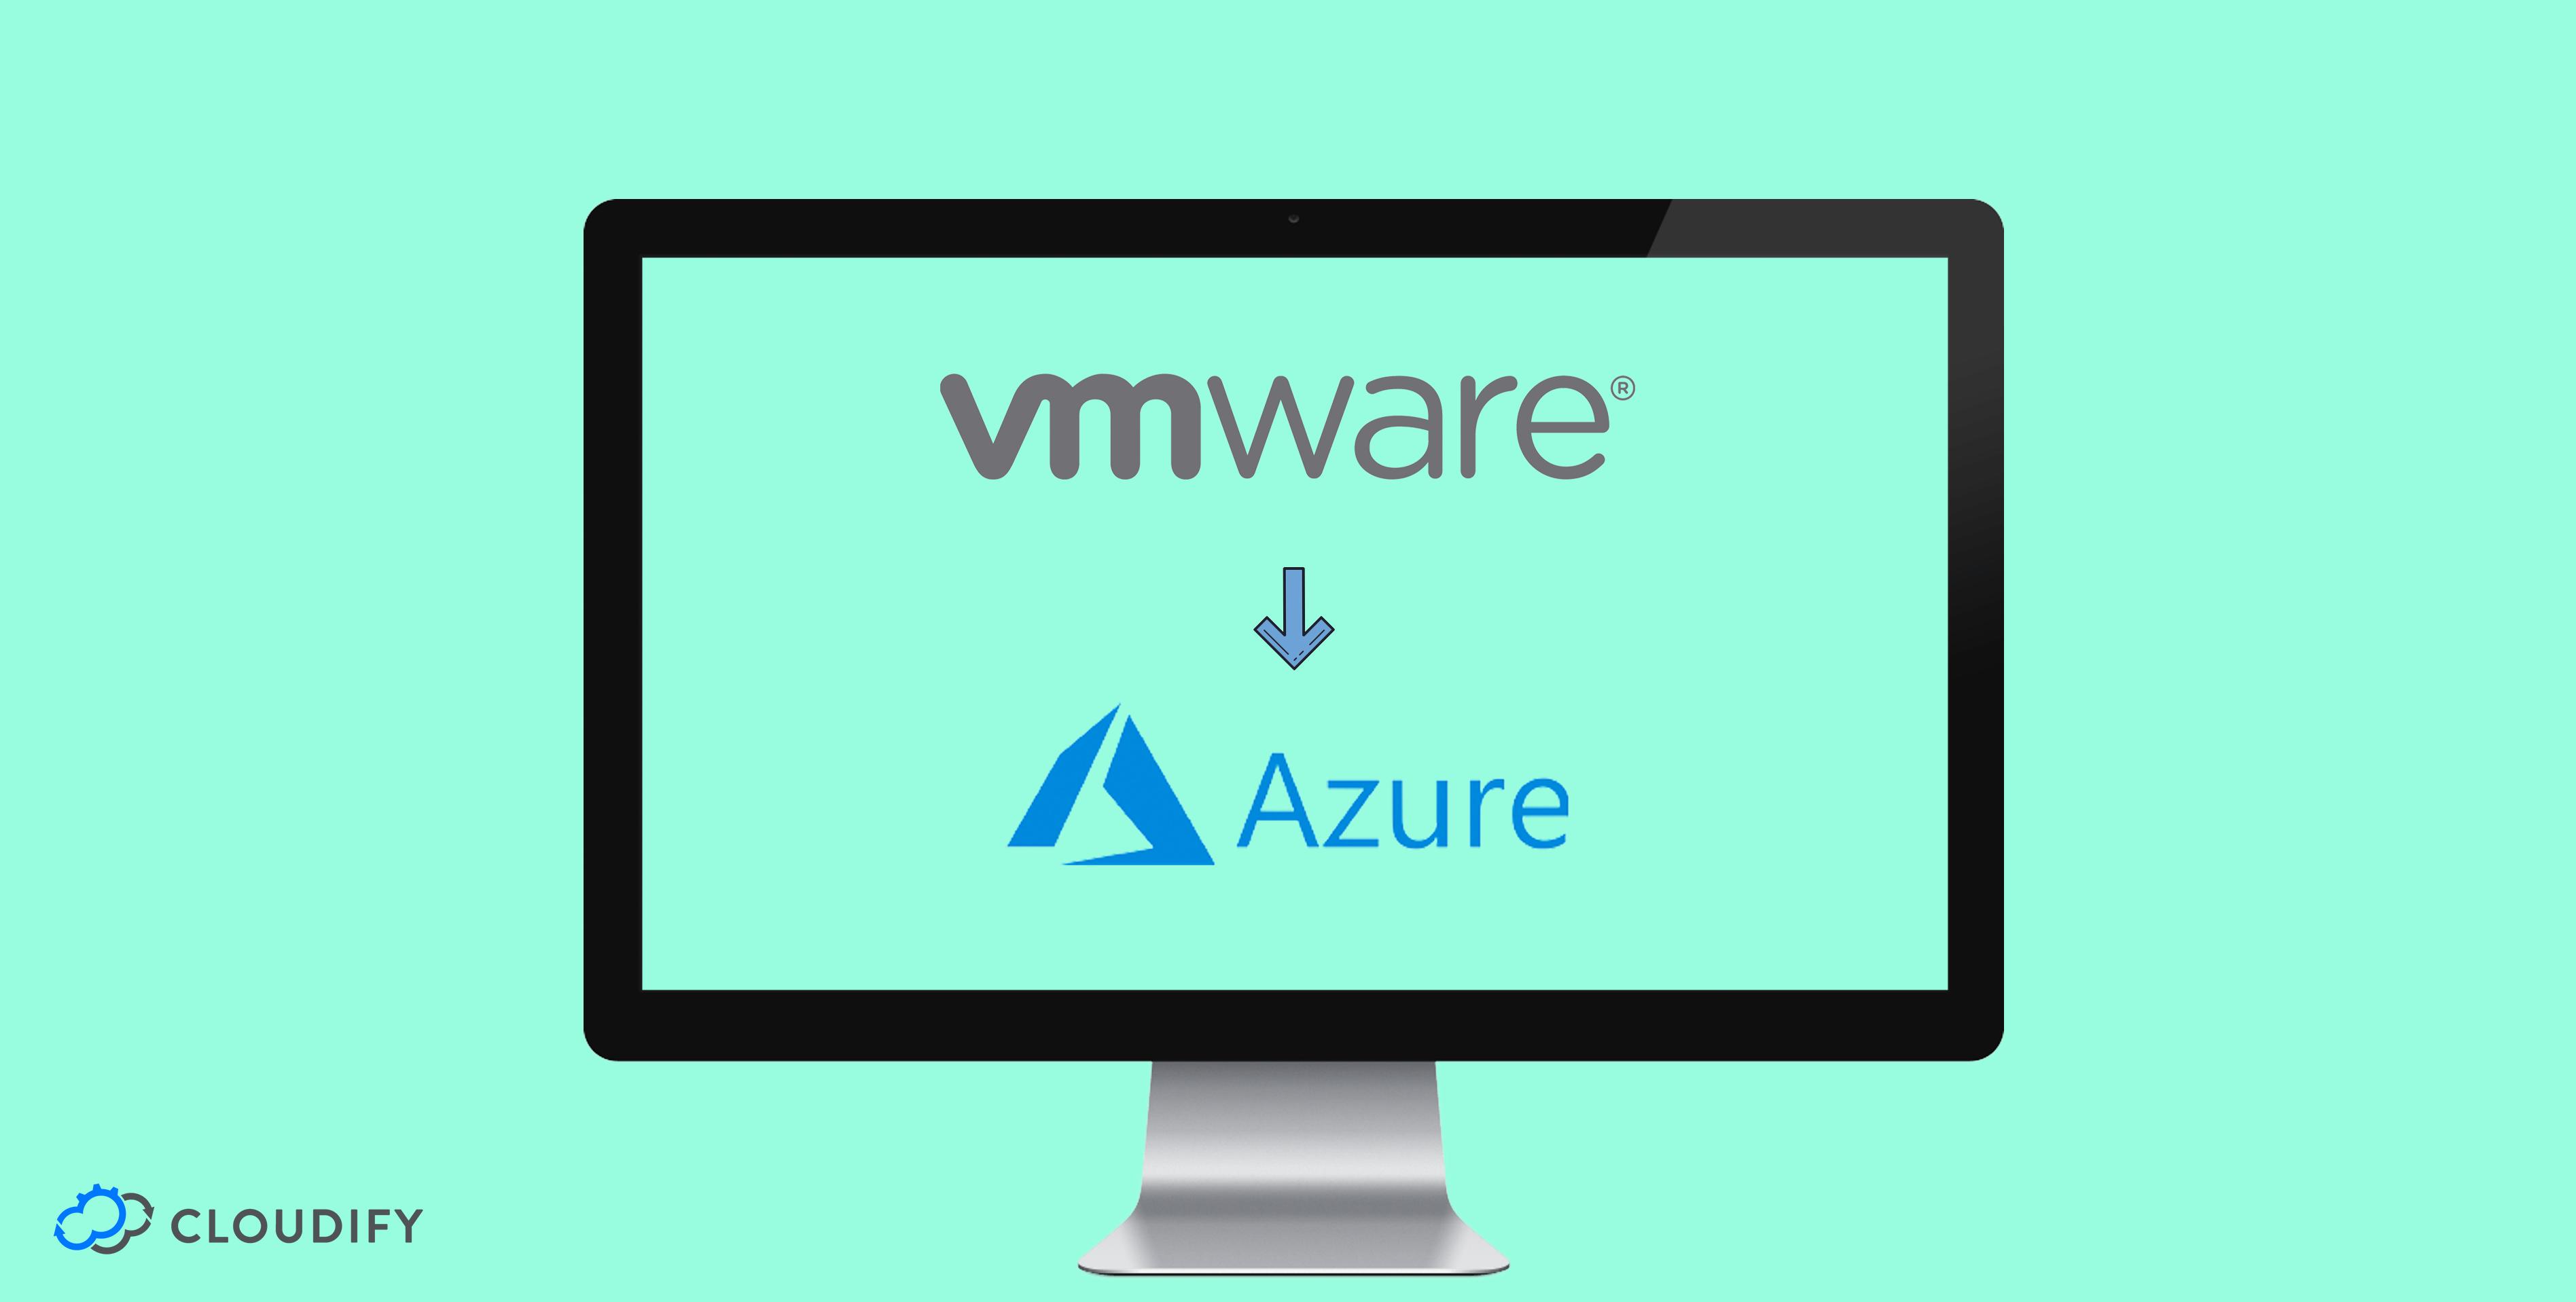 cloudify vmware azure